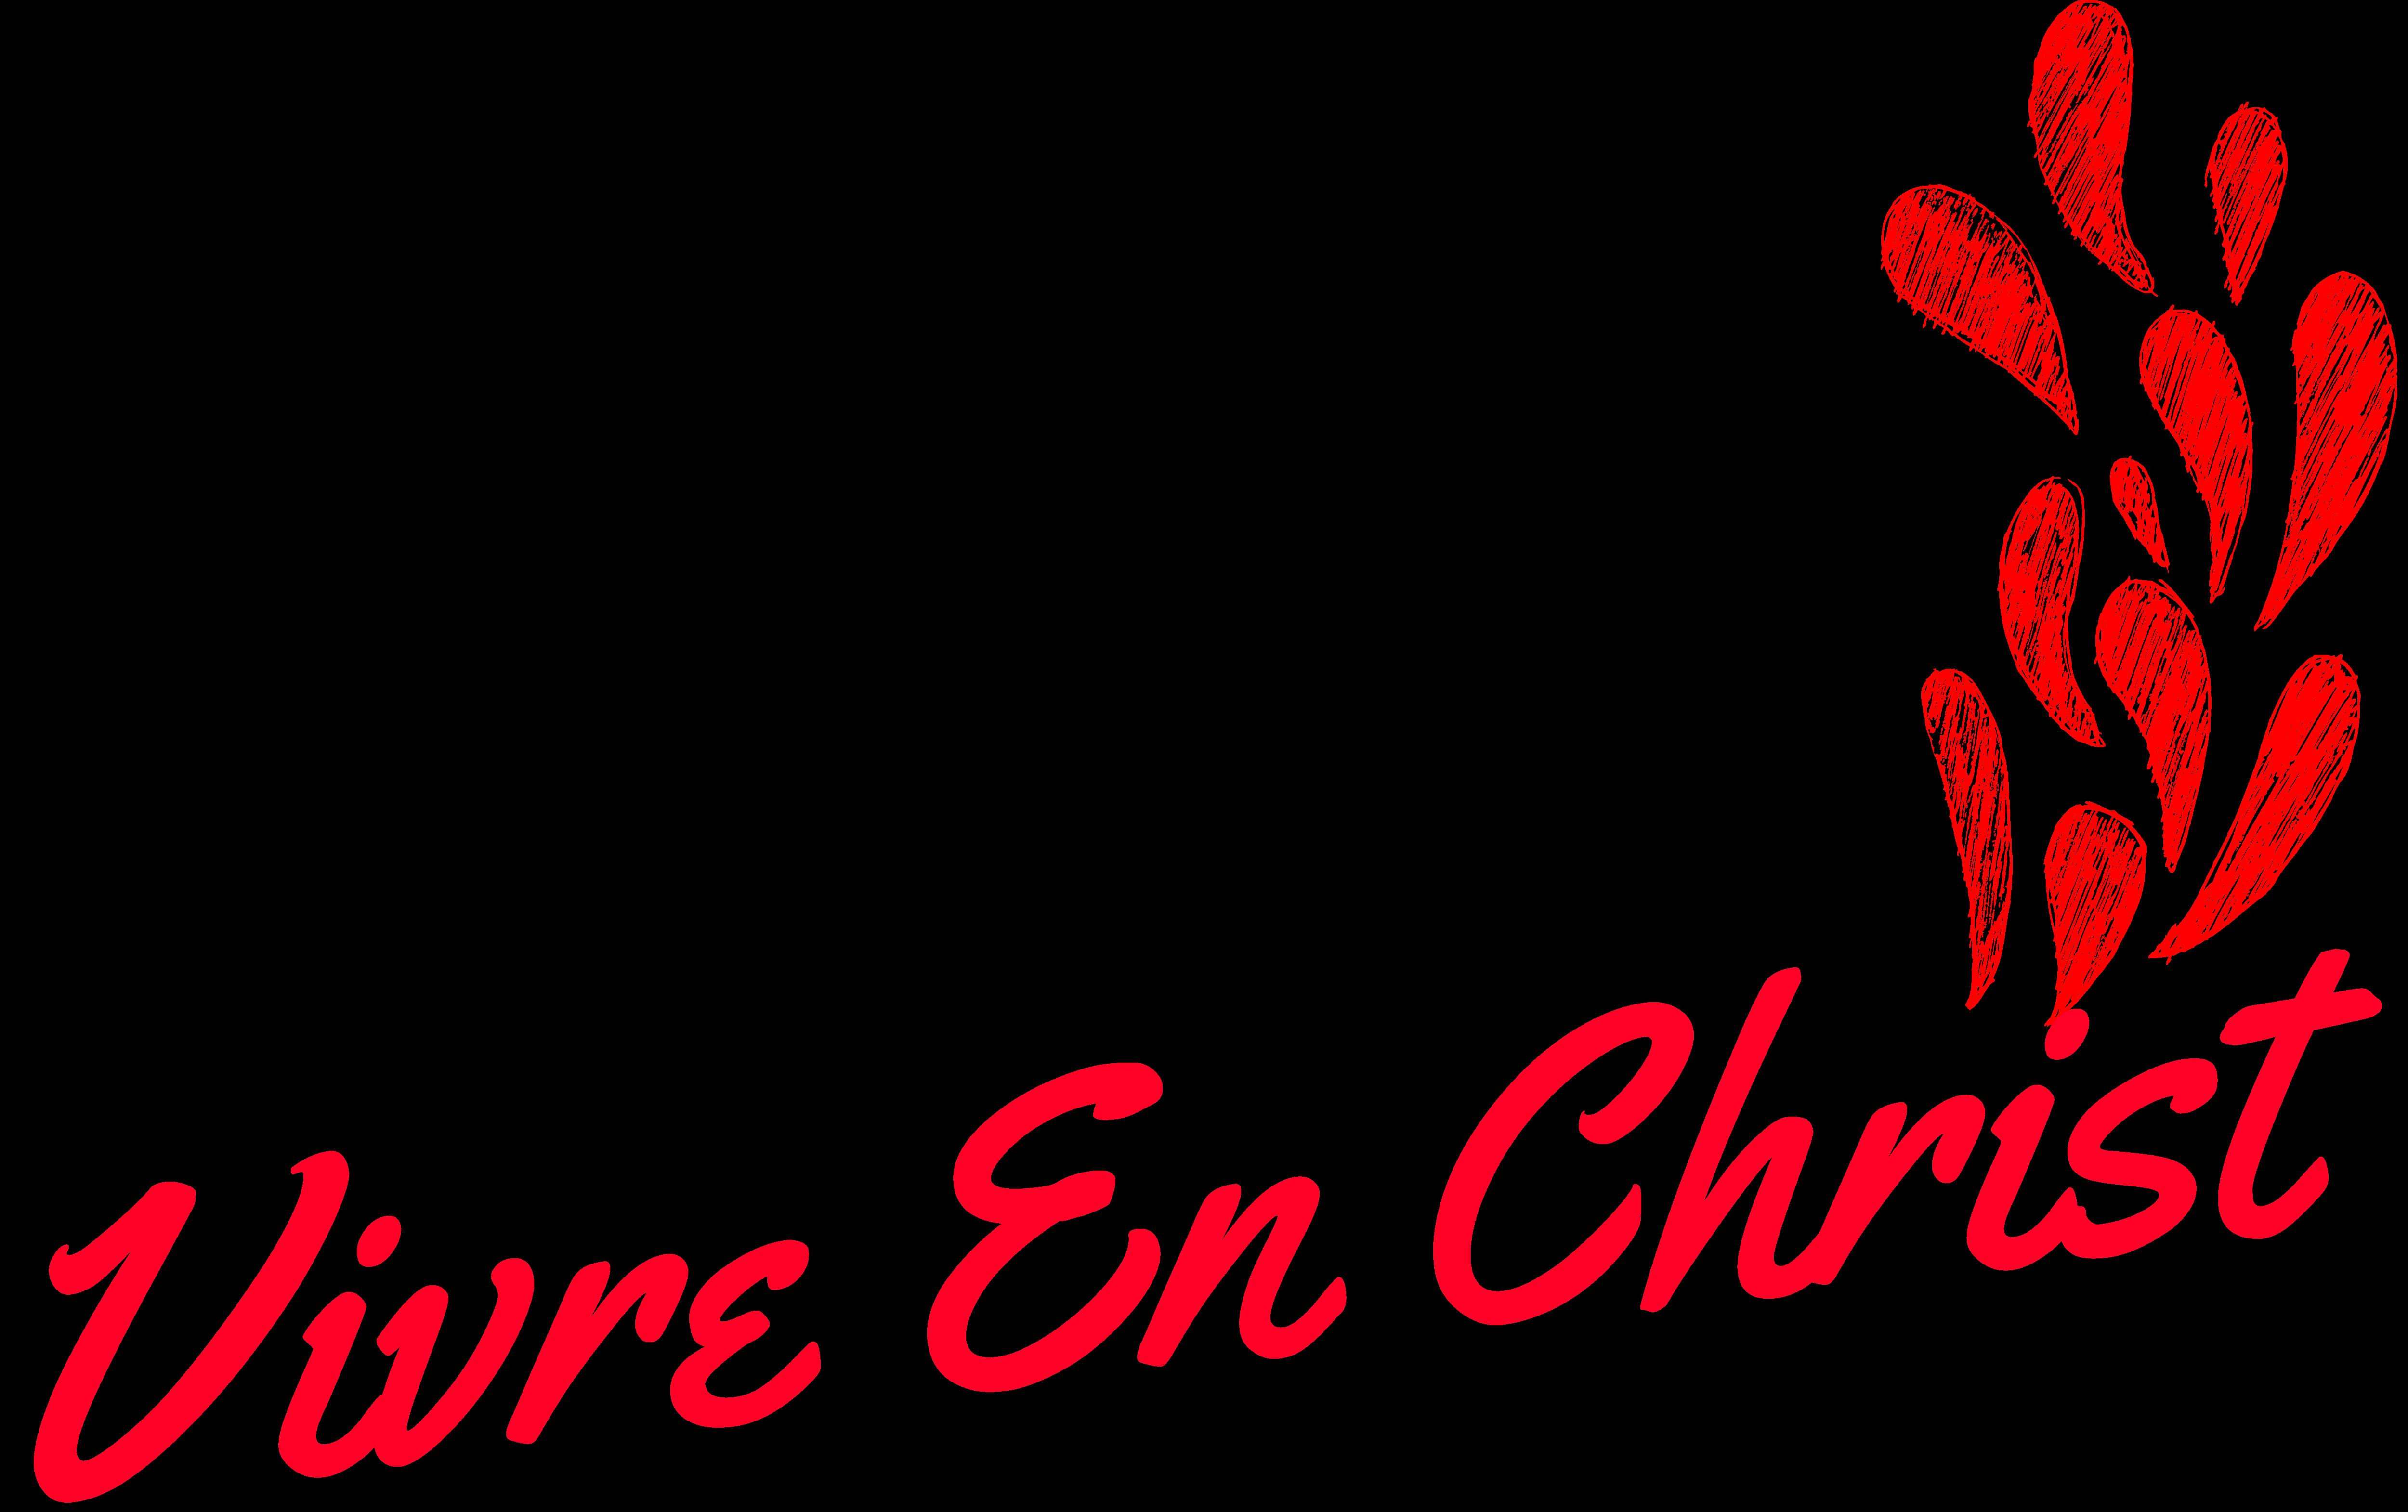 VIVRE EN CHRIST